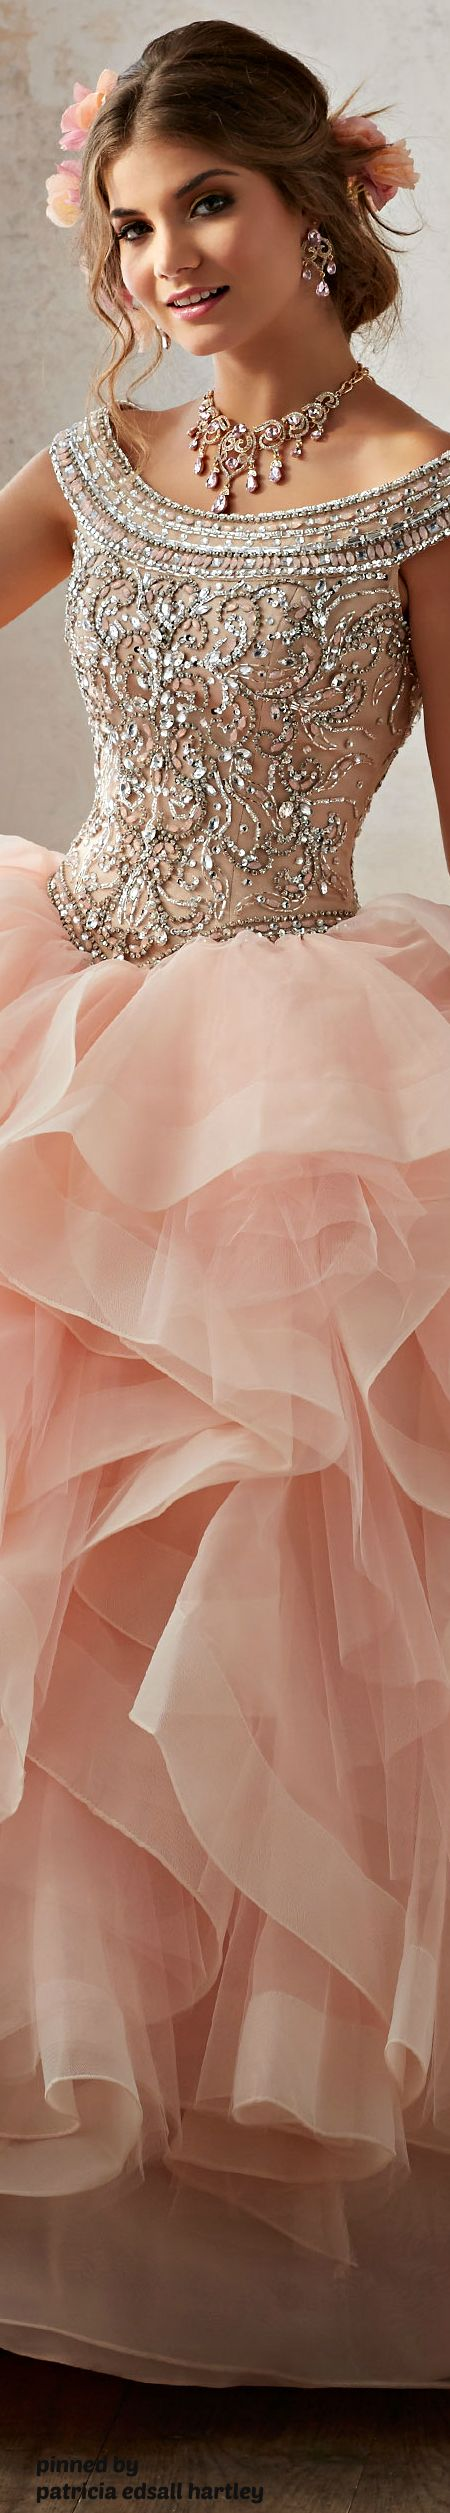 Beautiful Blush Wedding Dress With Crystal Encrusted Bodice